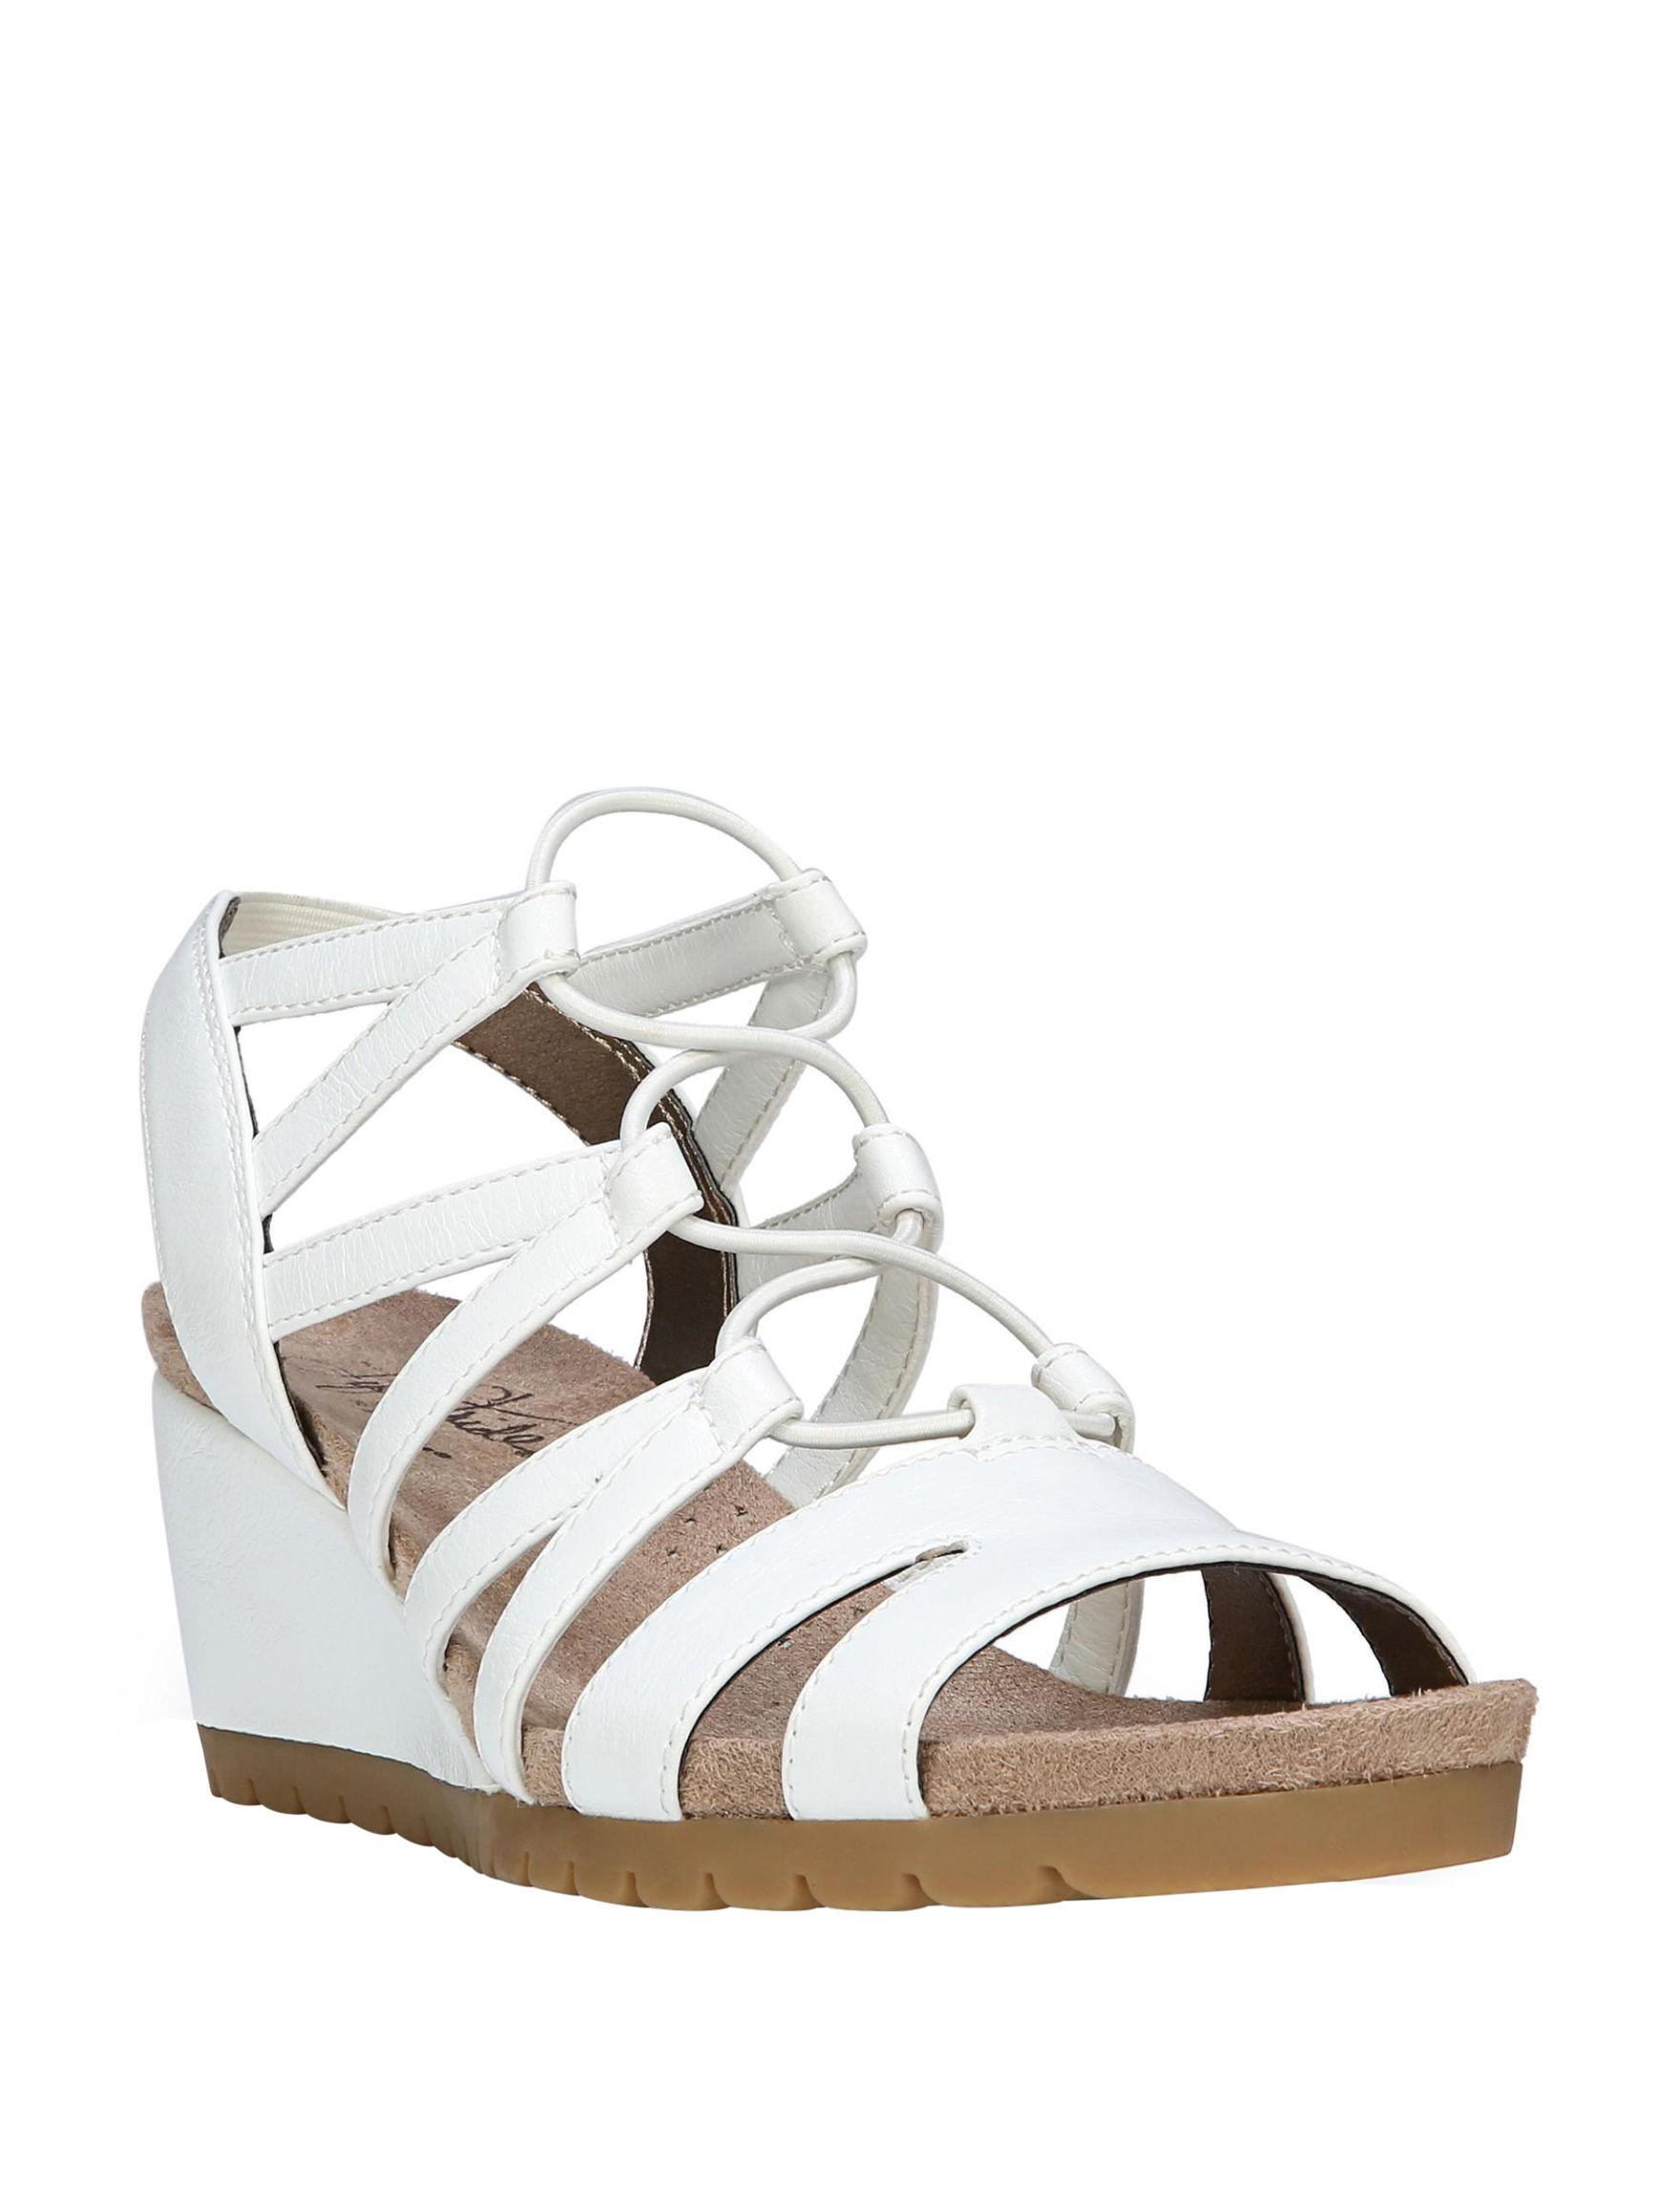 Lifestride White Heeled Sandals